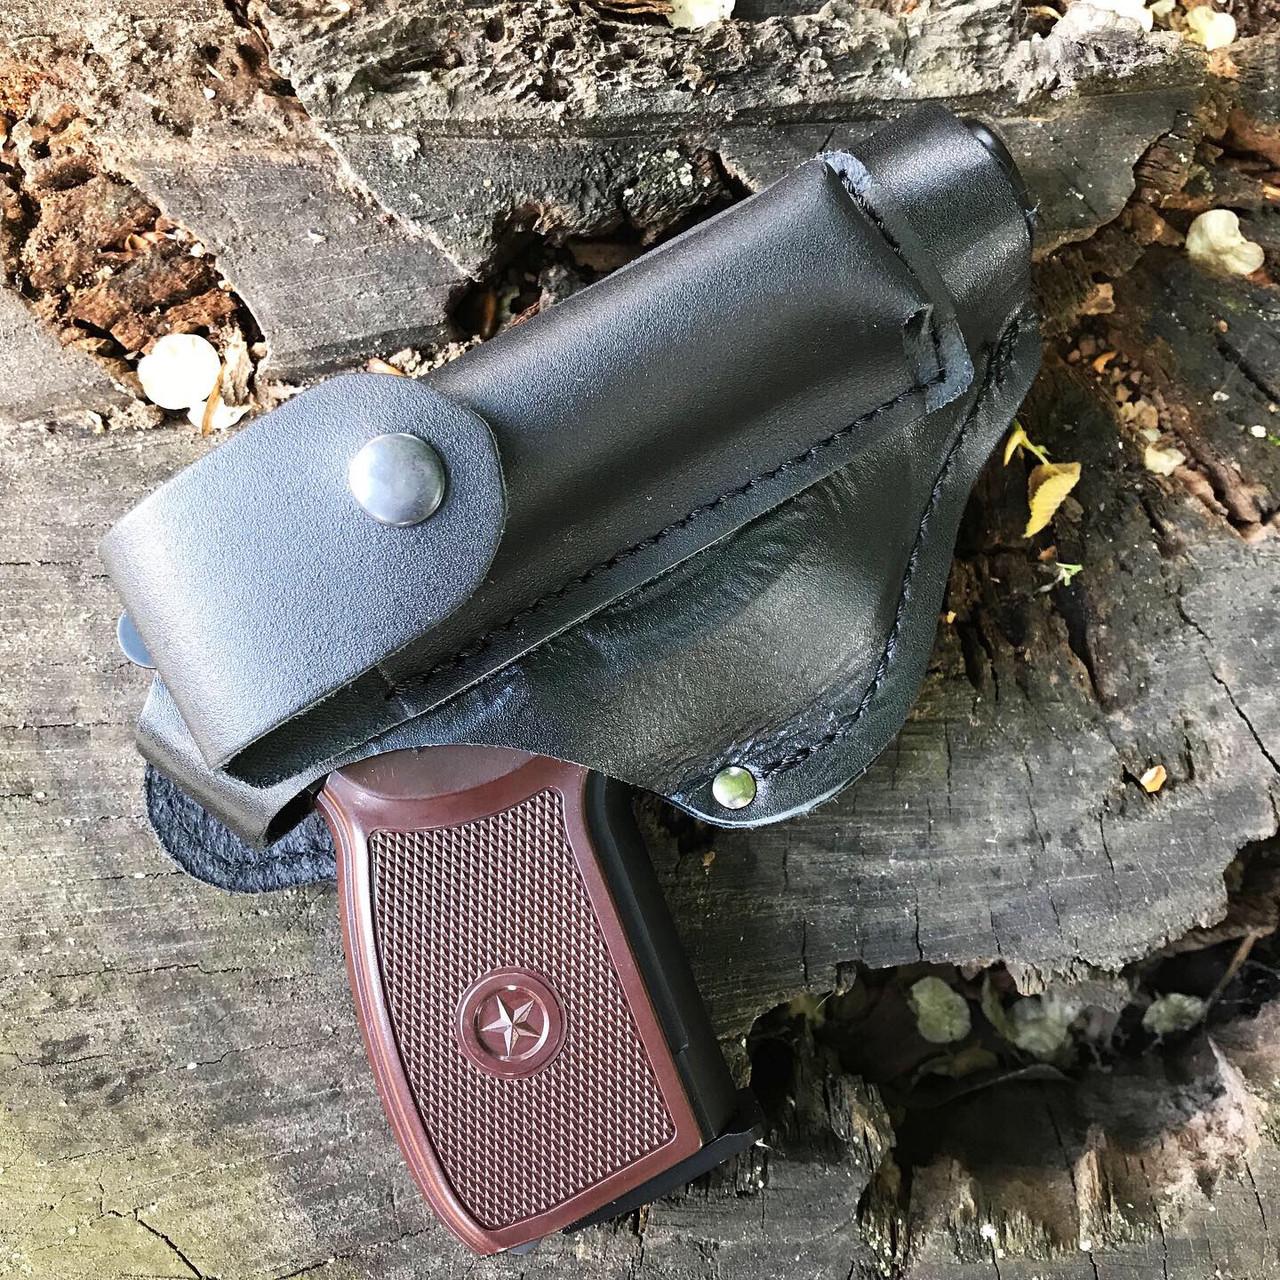 Кобура поясна ПМ, МР-654к з кишенею для магазину (шкіра)